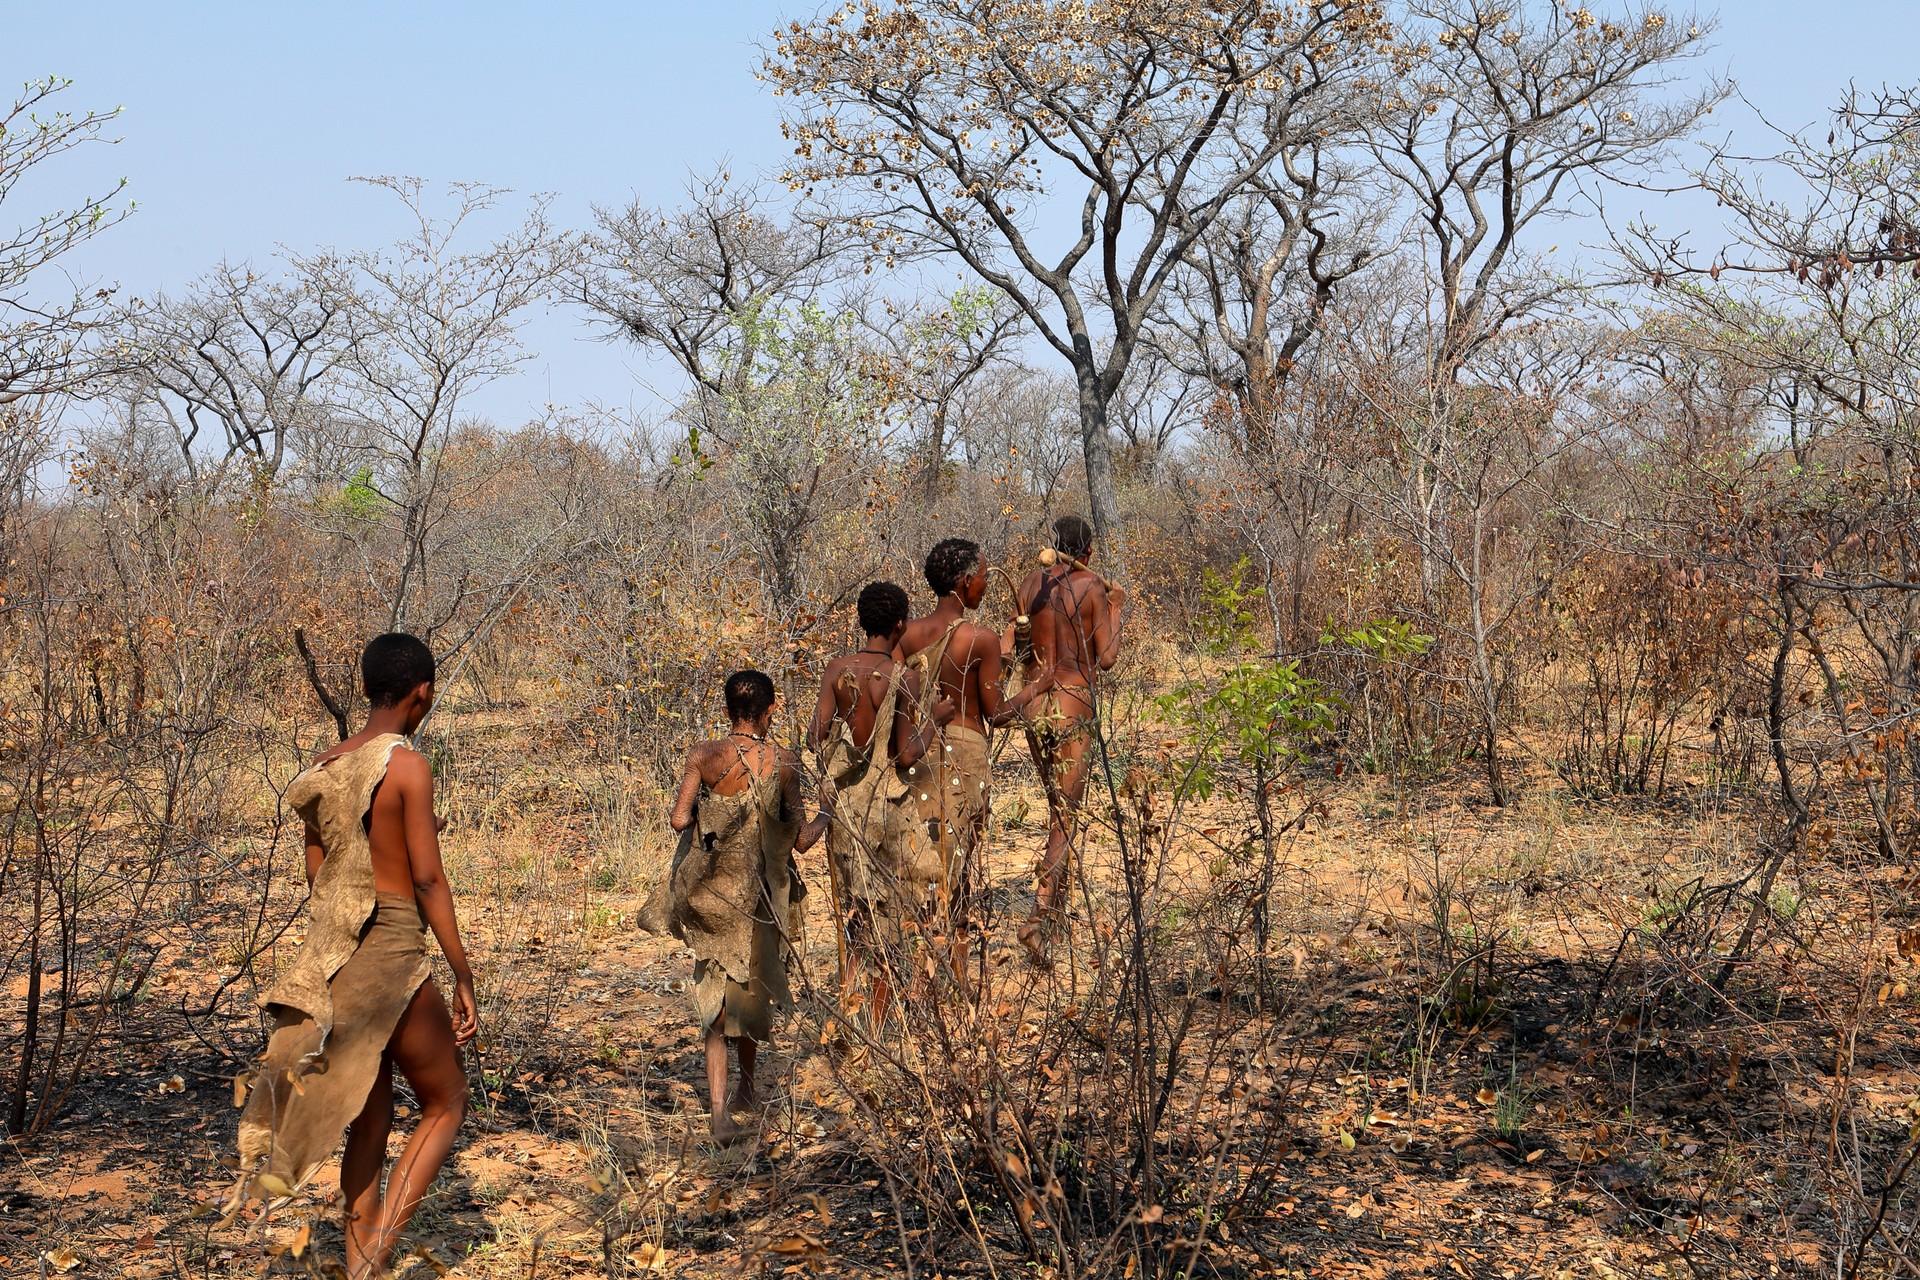 San Bushmen in the Kalahari Desert in Botswana